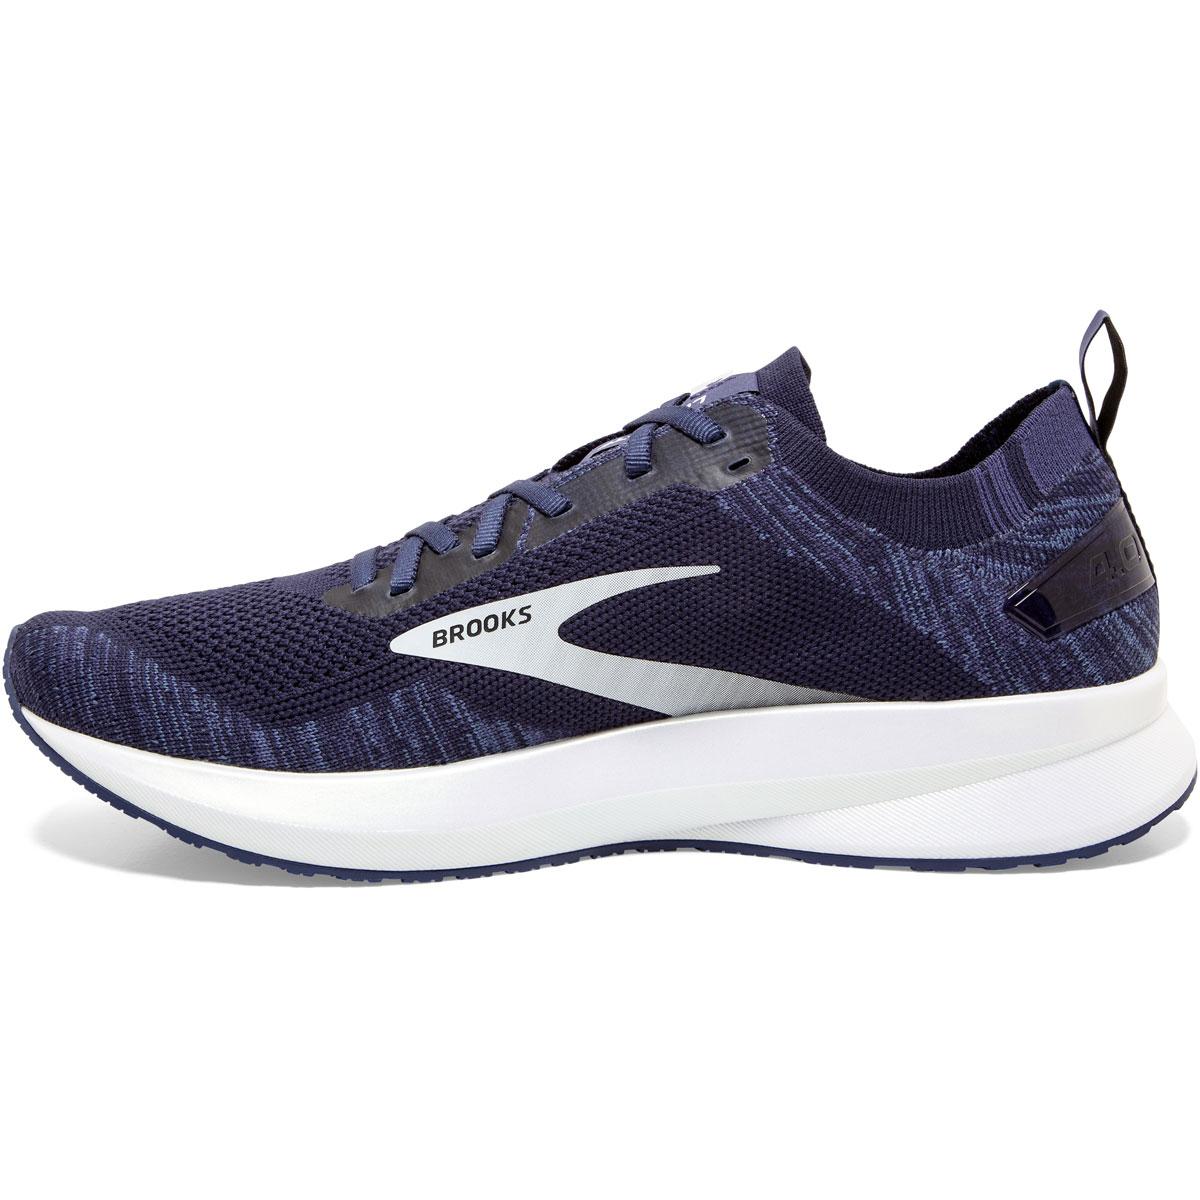 Men's Brooks Levitate 4 Running Shoe - Color: Navy/Grey/White - Size: 7 - Width: Regular, Navy/Grey/White, large, image 3